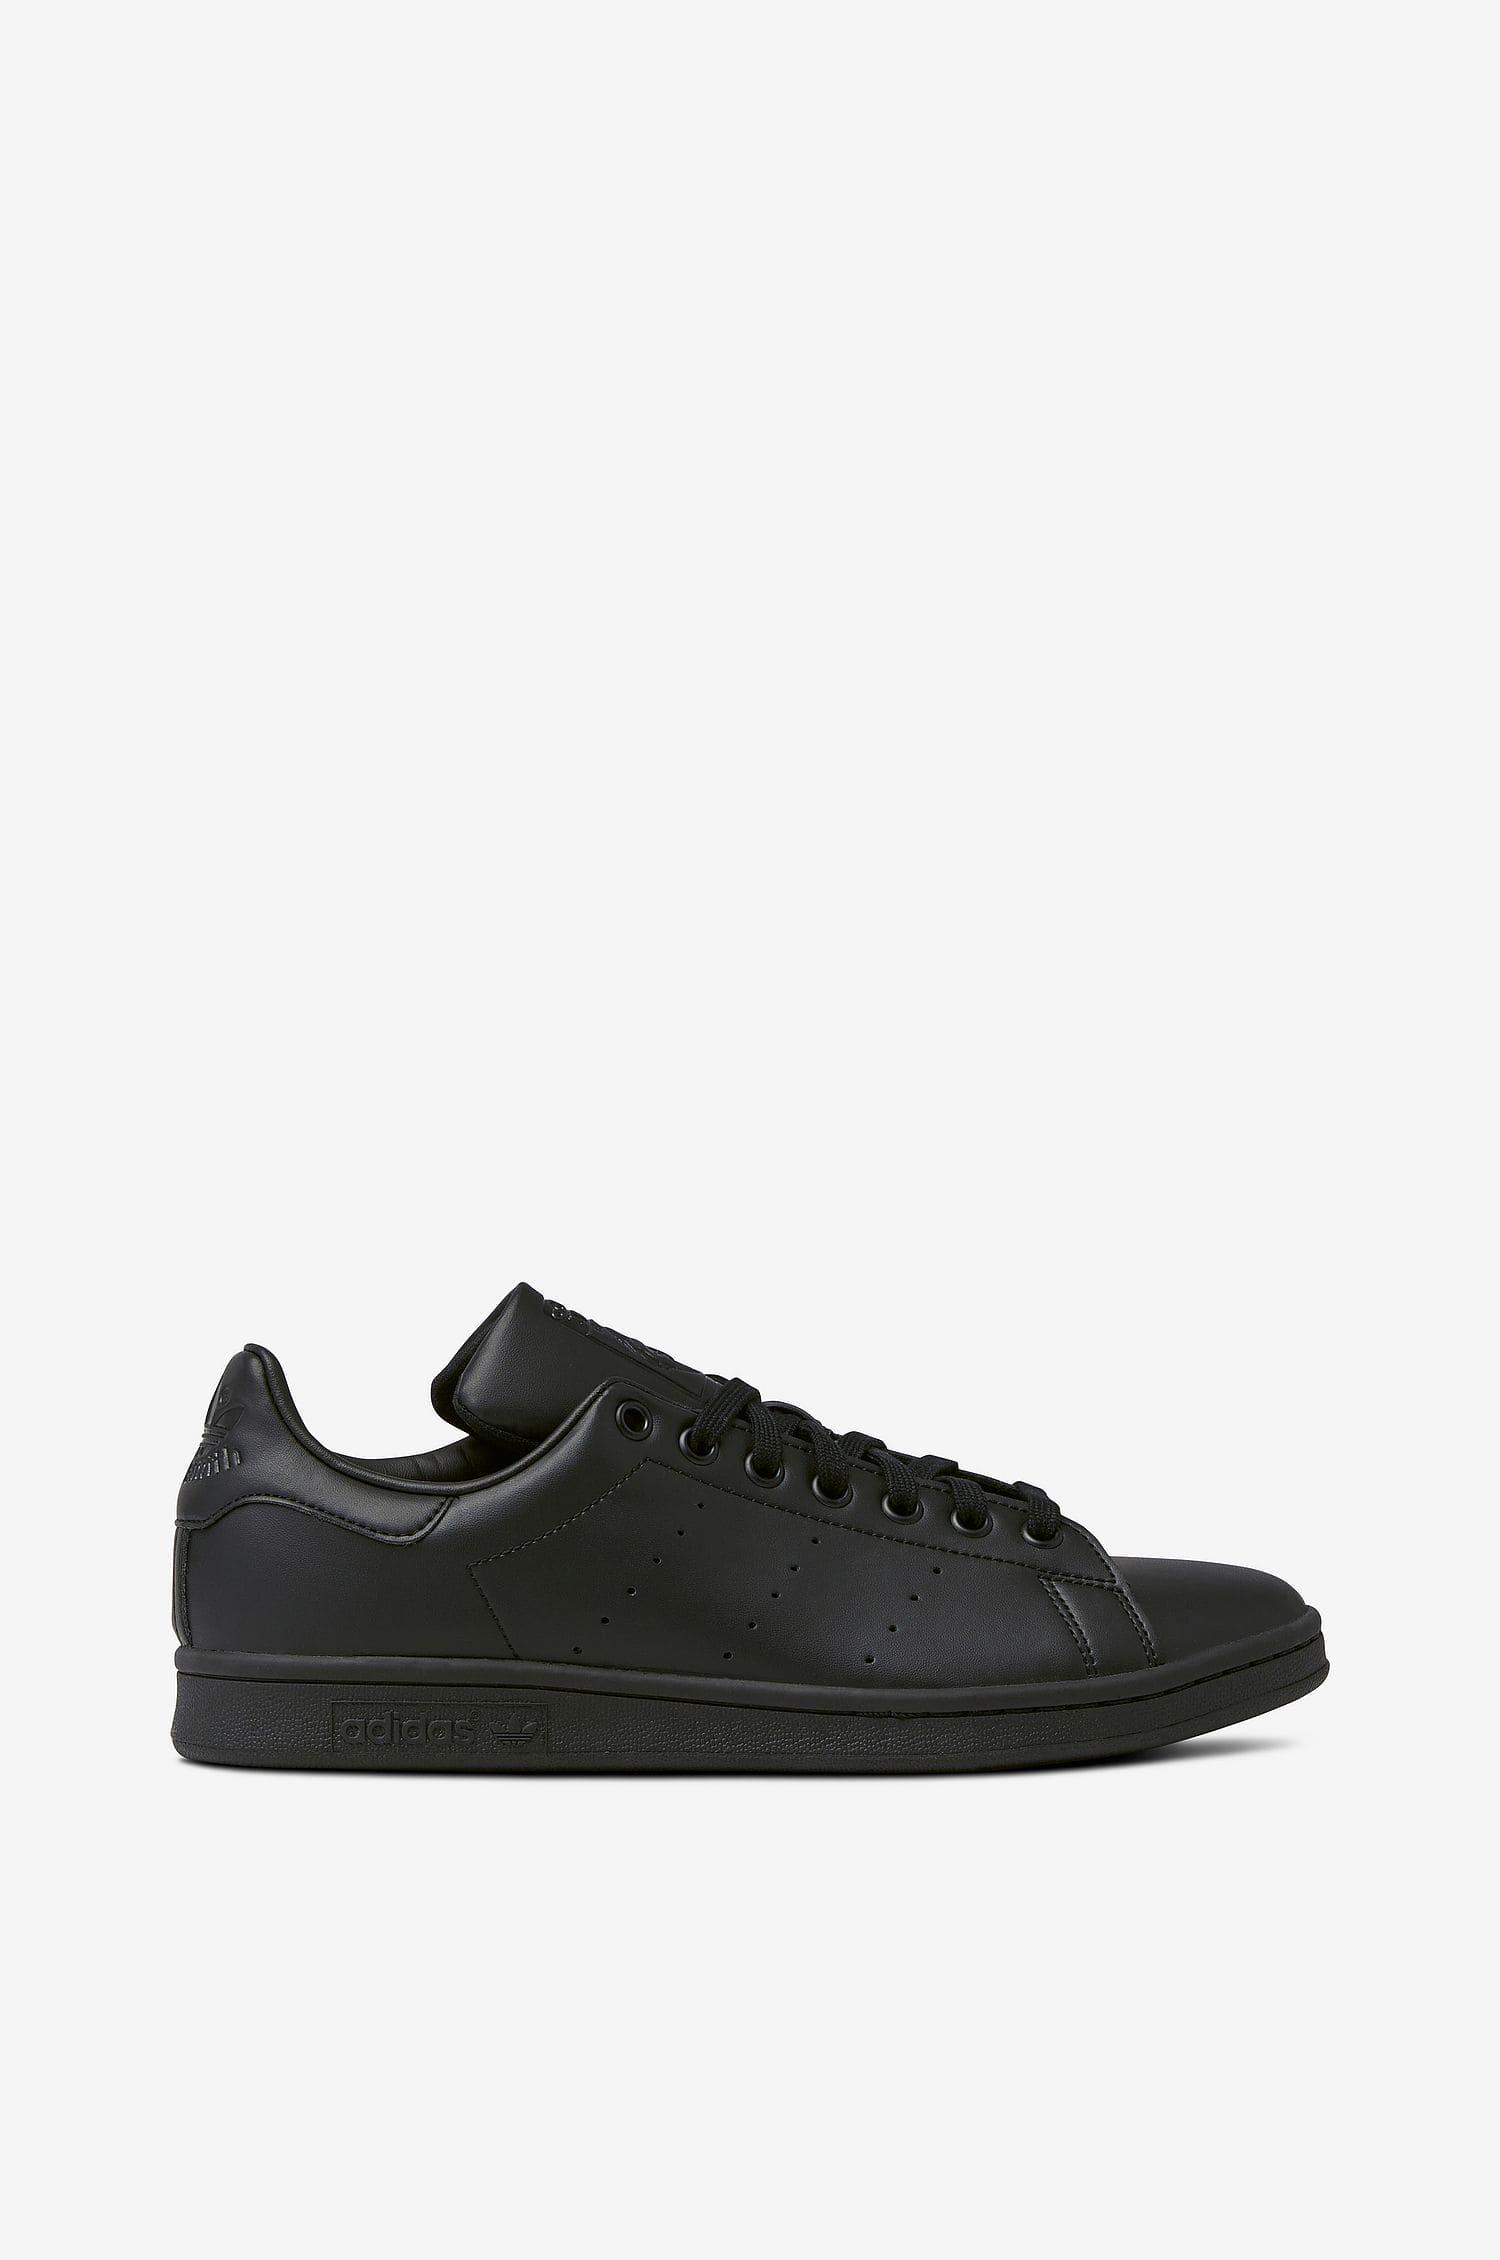 Adidas sneakers i skinnimitation från Stan Smith